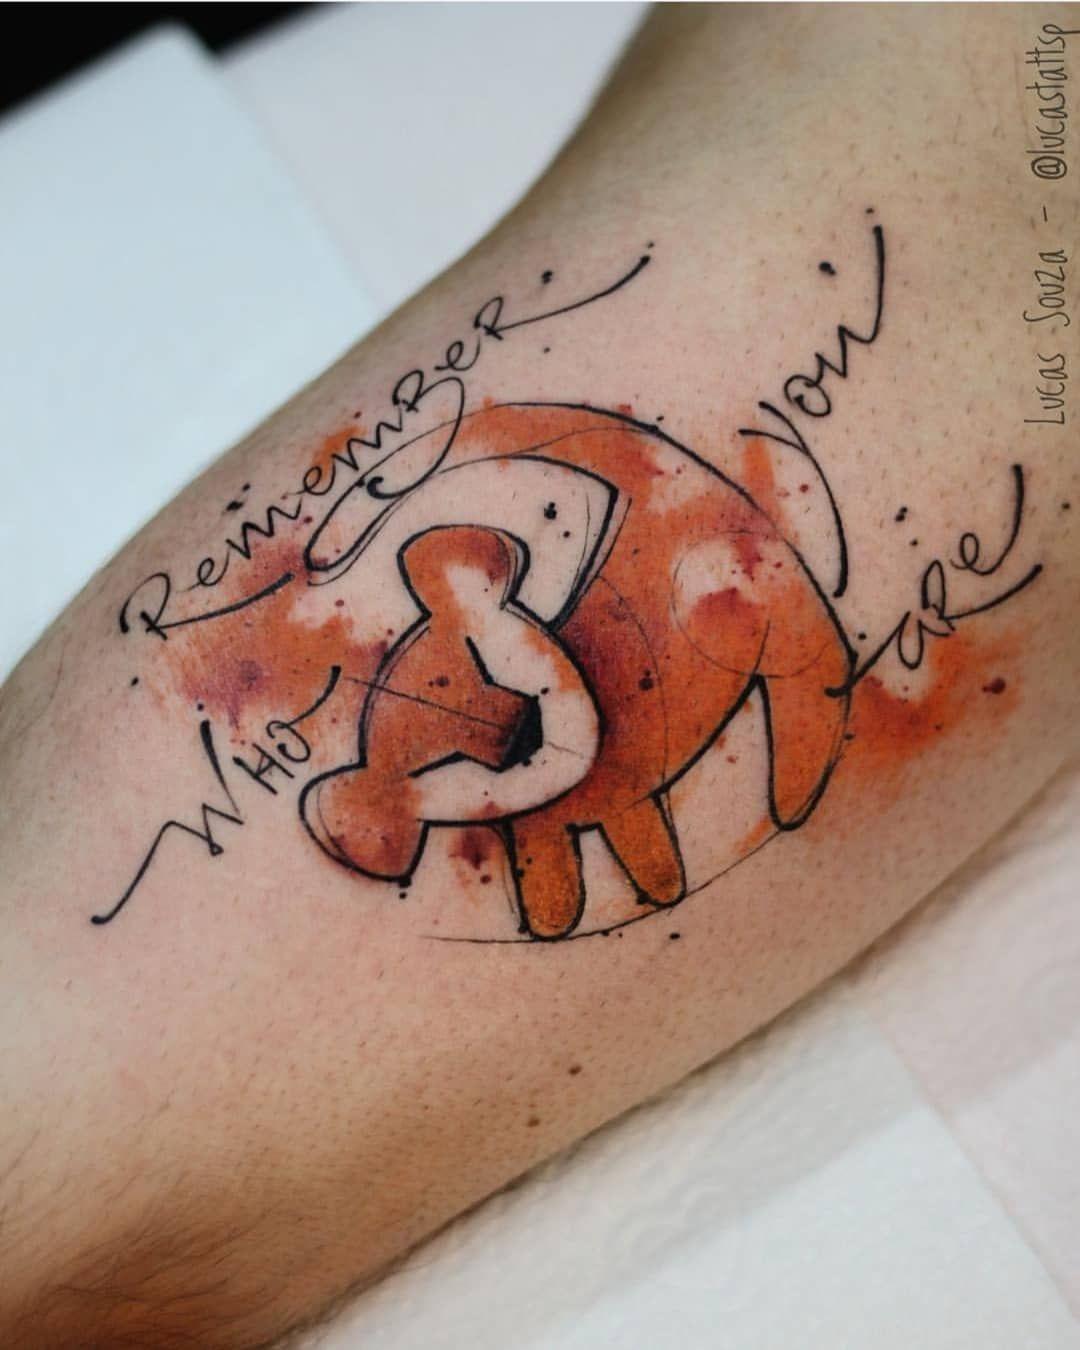 "TATTOOSELECTION on Instagram: ""Tattoo Artist @lucastattsp ________________________________ #tattooselection #tattoo #tattooed #tatuaje #tatuaggio #taty #tatoo # ink…"""